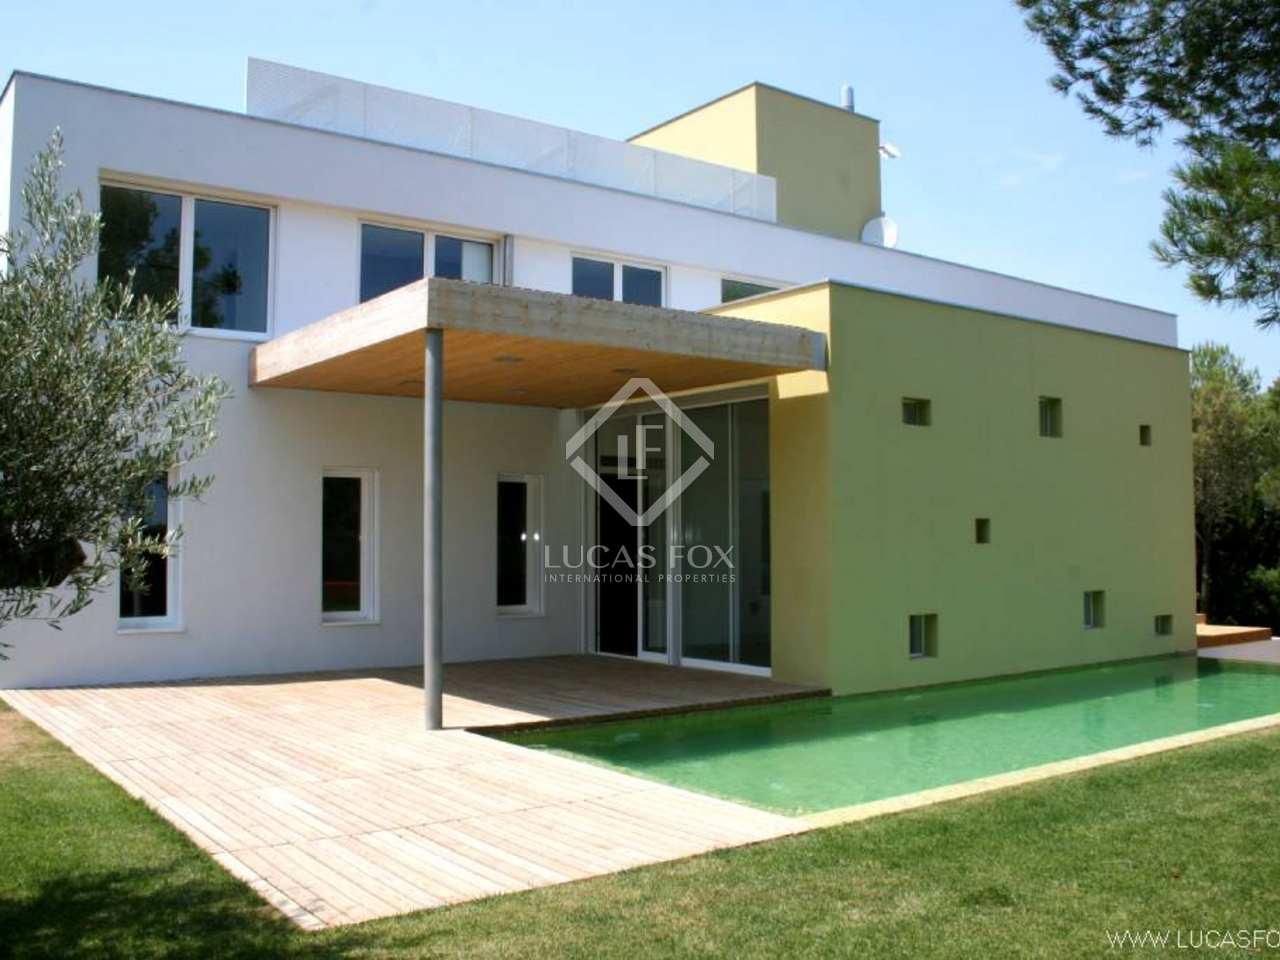 Casa moderna de lujo en venta cerca de begur en la costa for Casa moderna espana